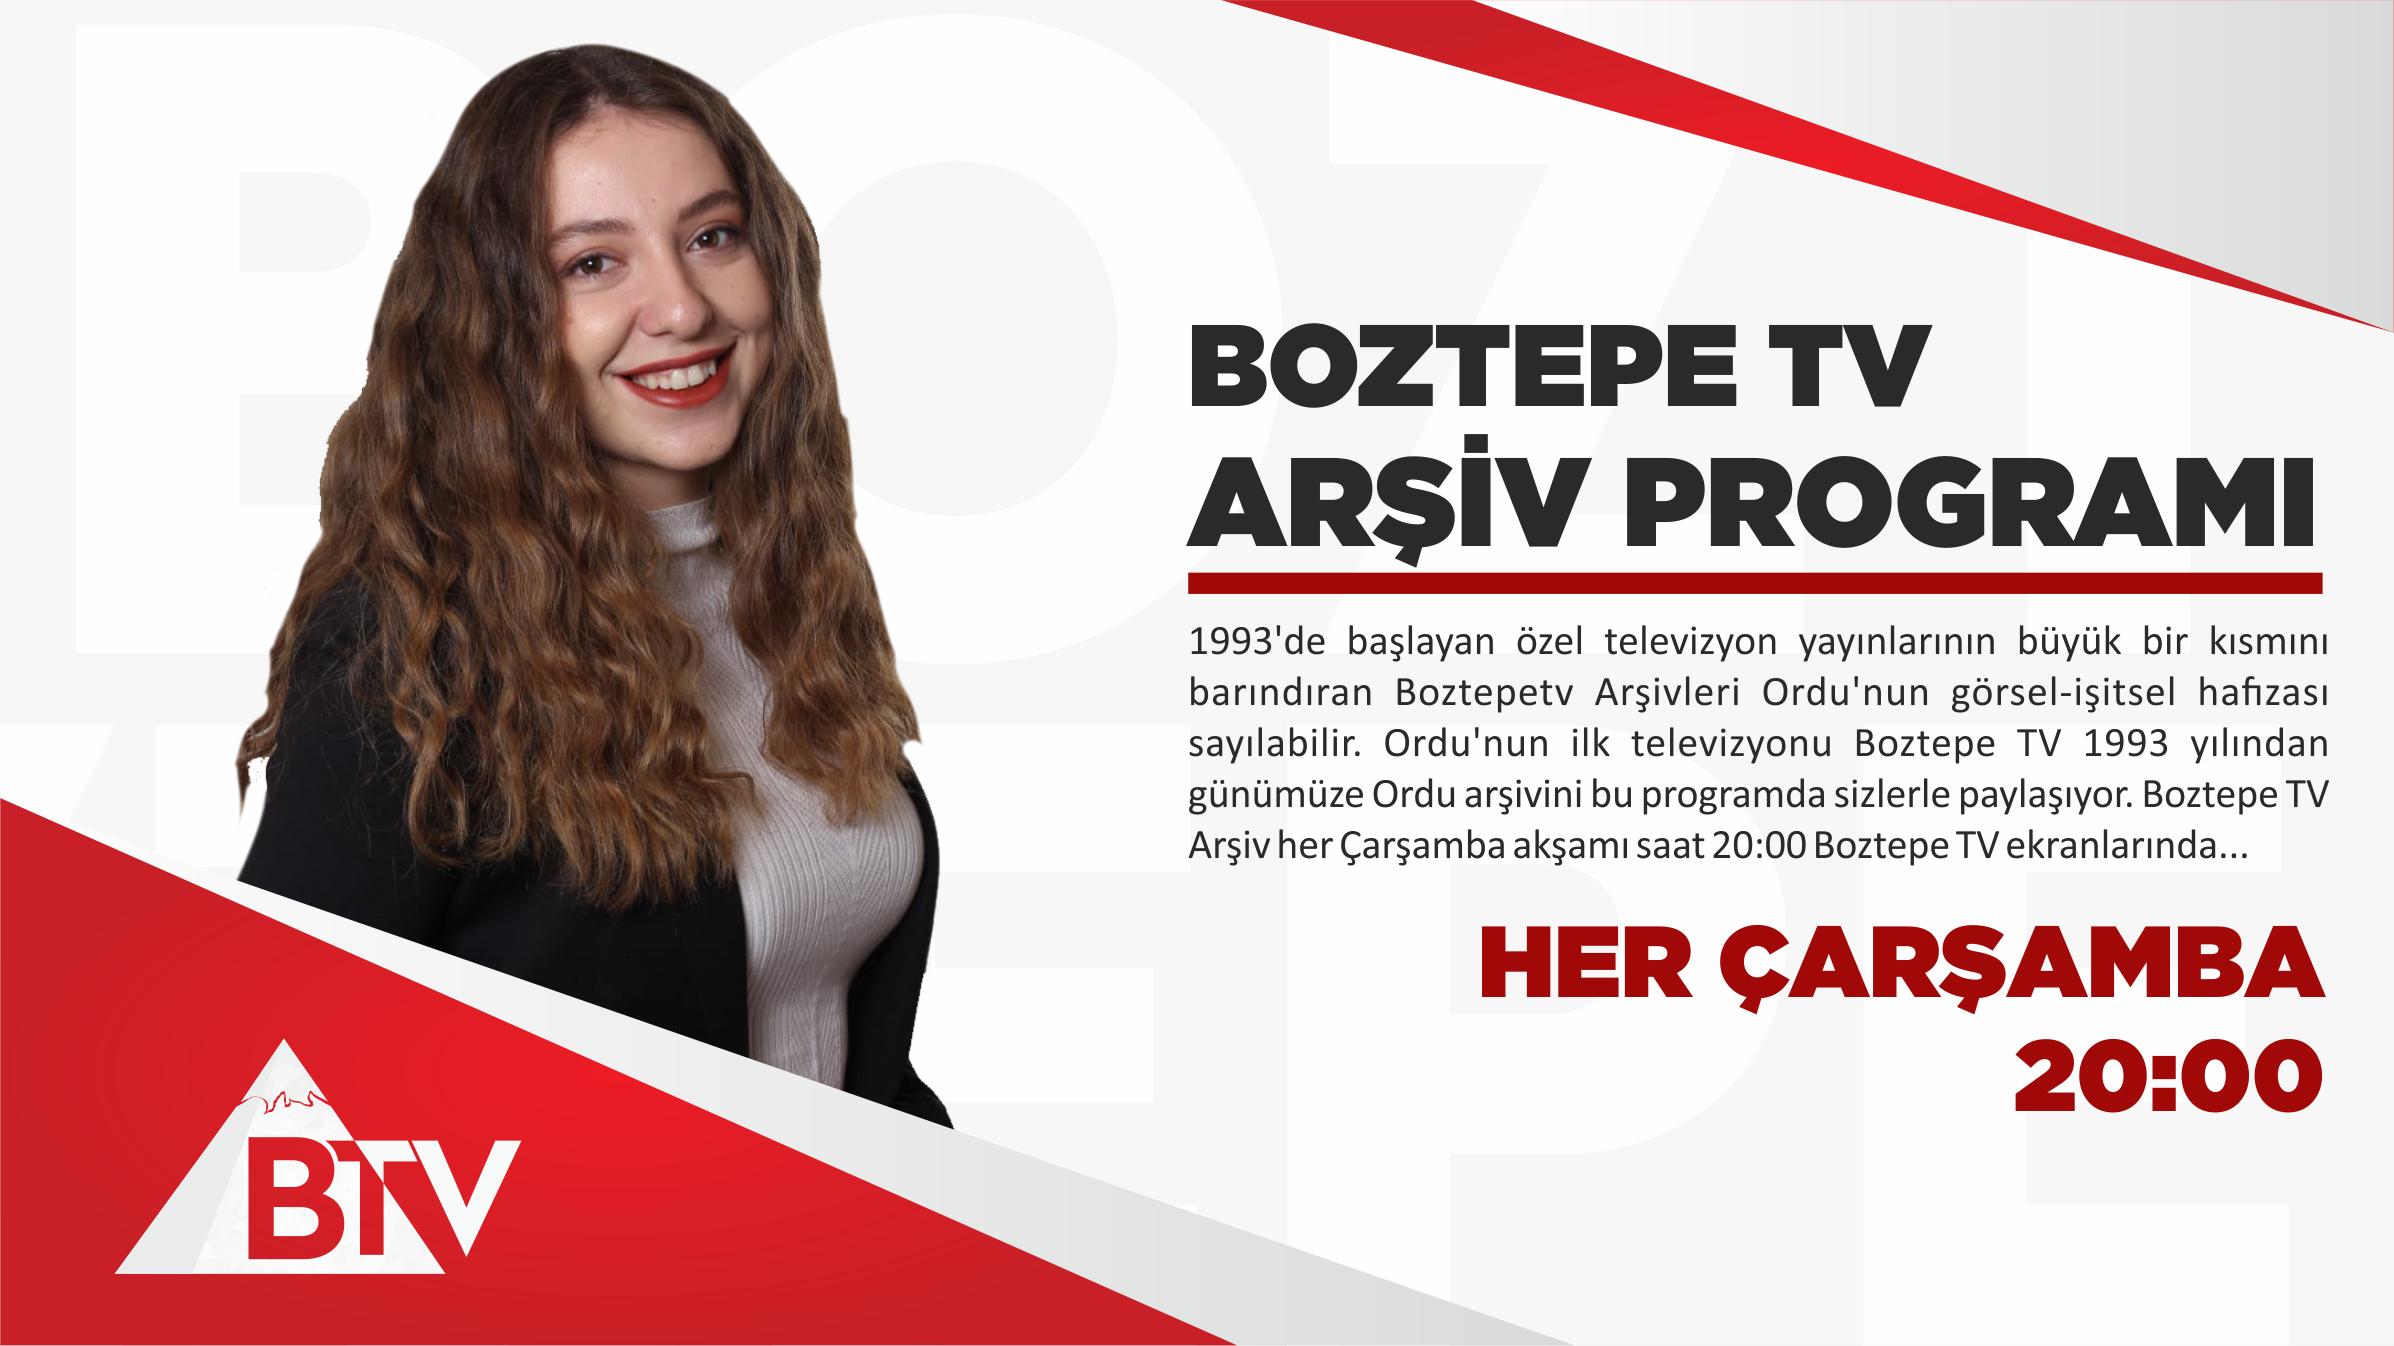 Boztepe Tv Arşiv